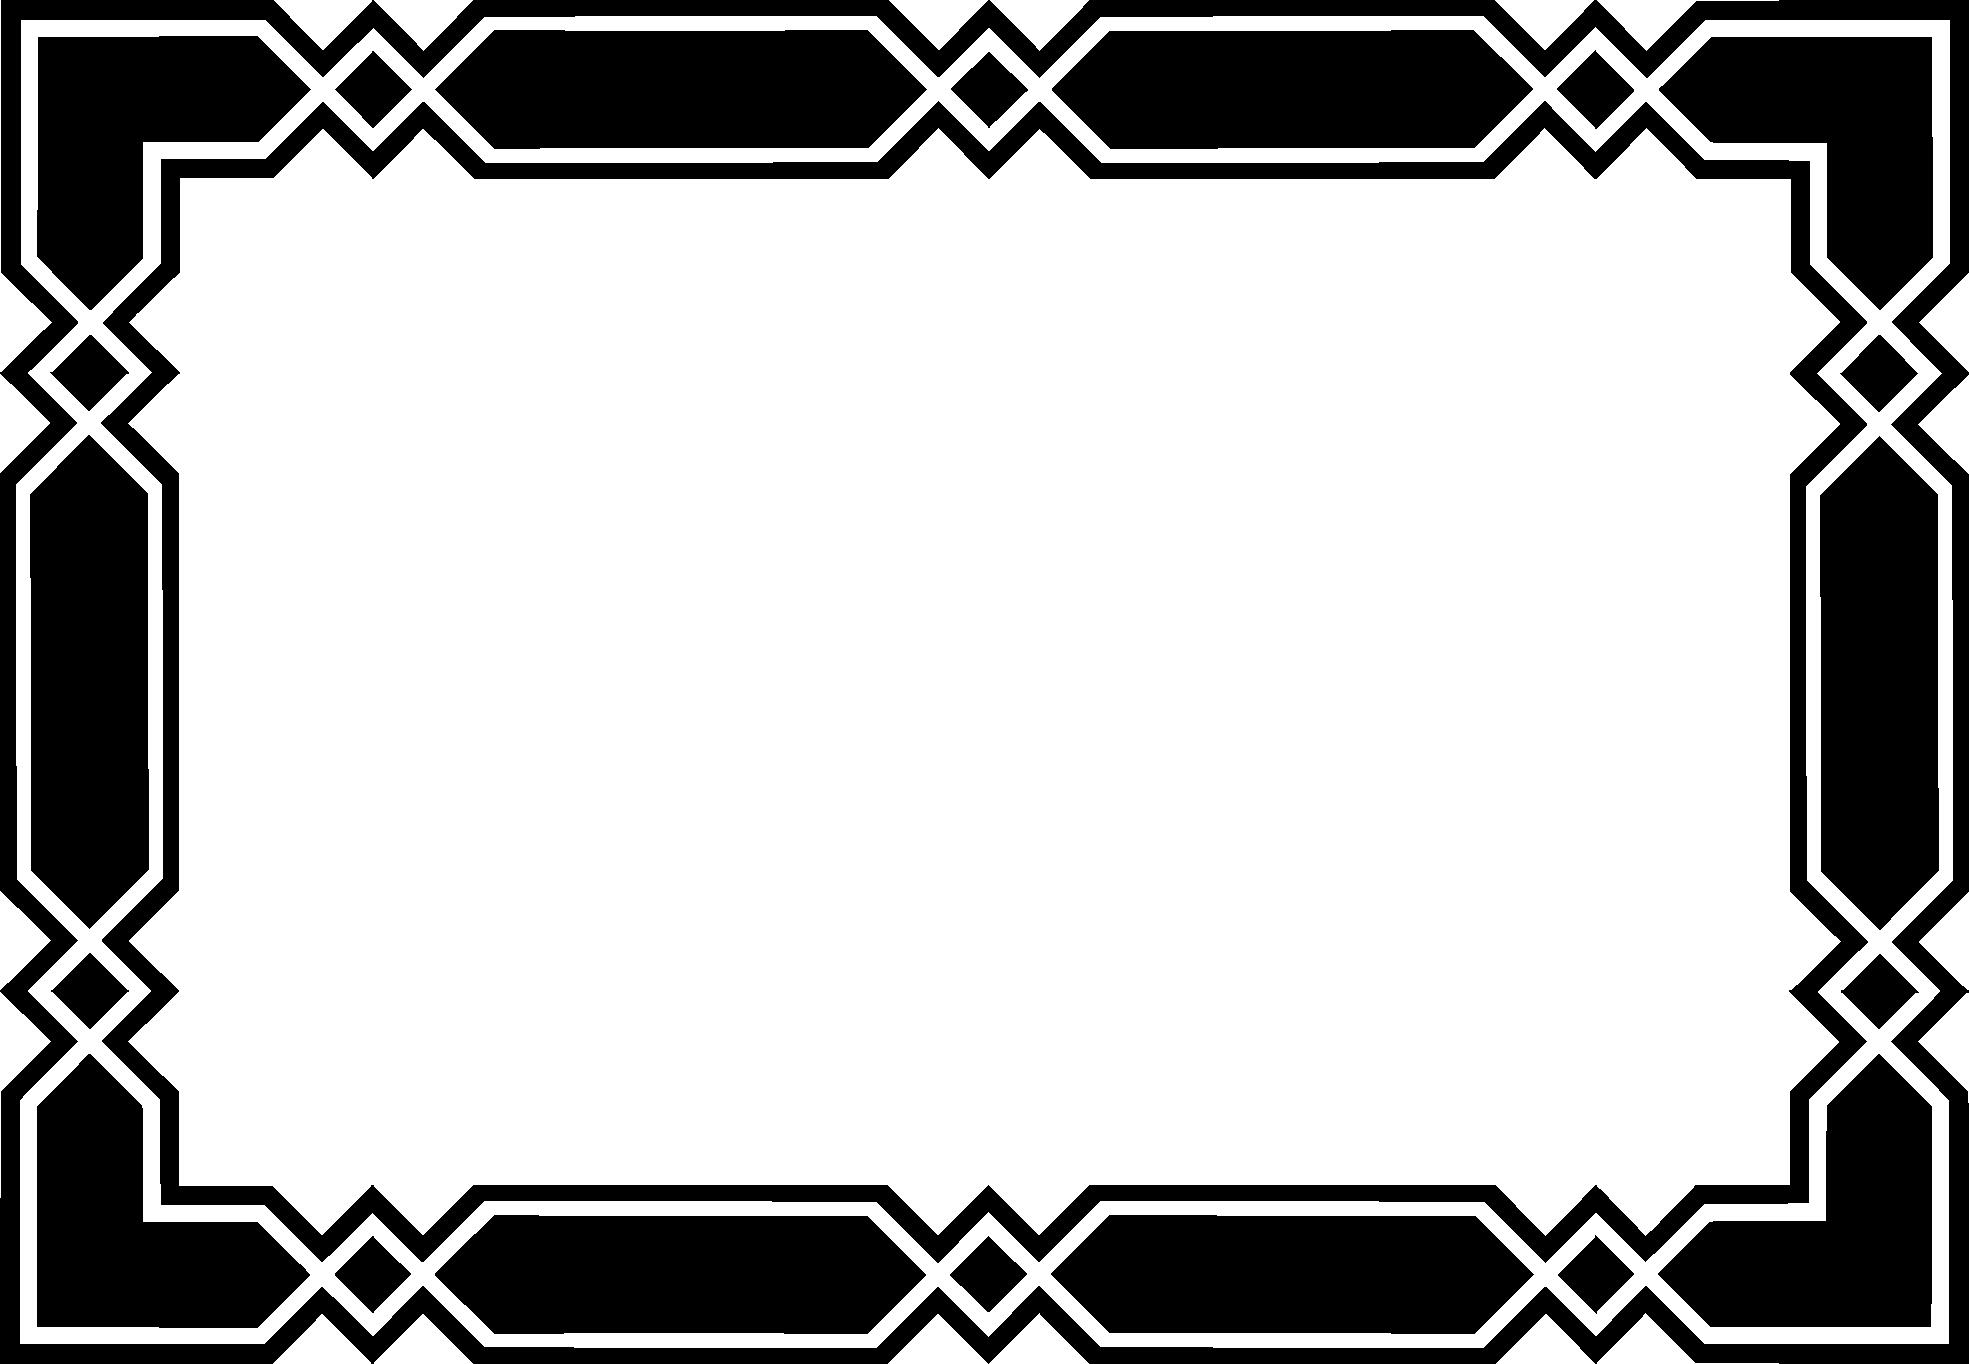 Frame Border Abstract Emblem Decorative - Ecohomeplus.com